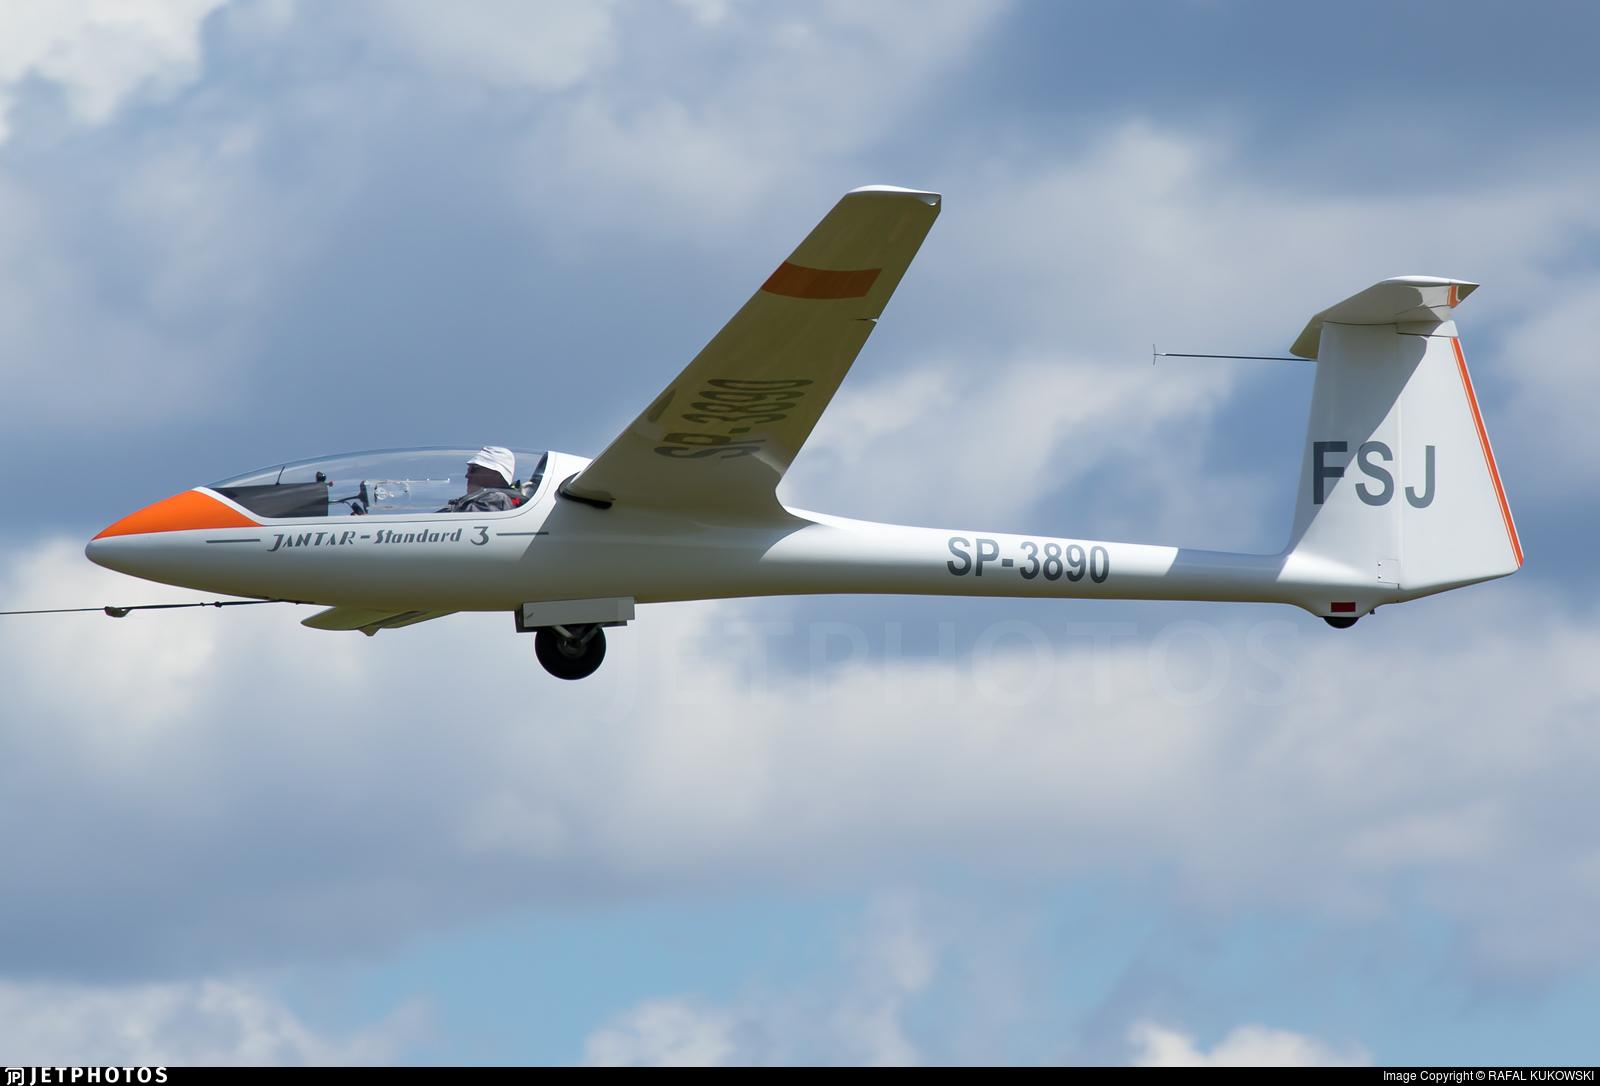 SP-3890 - SZD 48-3 Jantar Standard III - Private